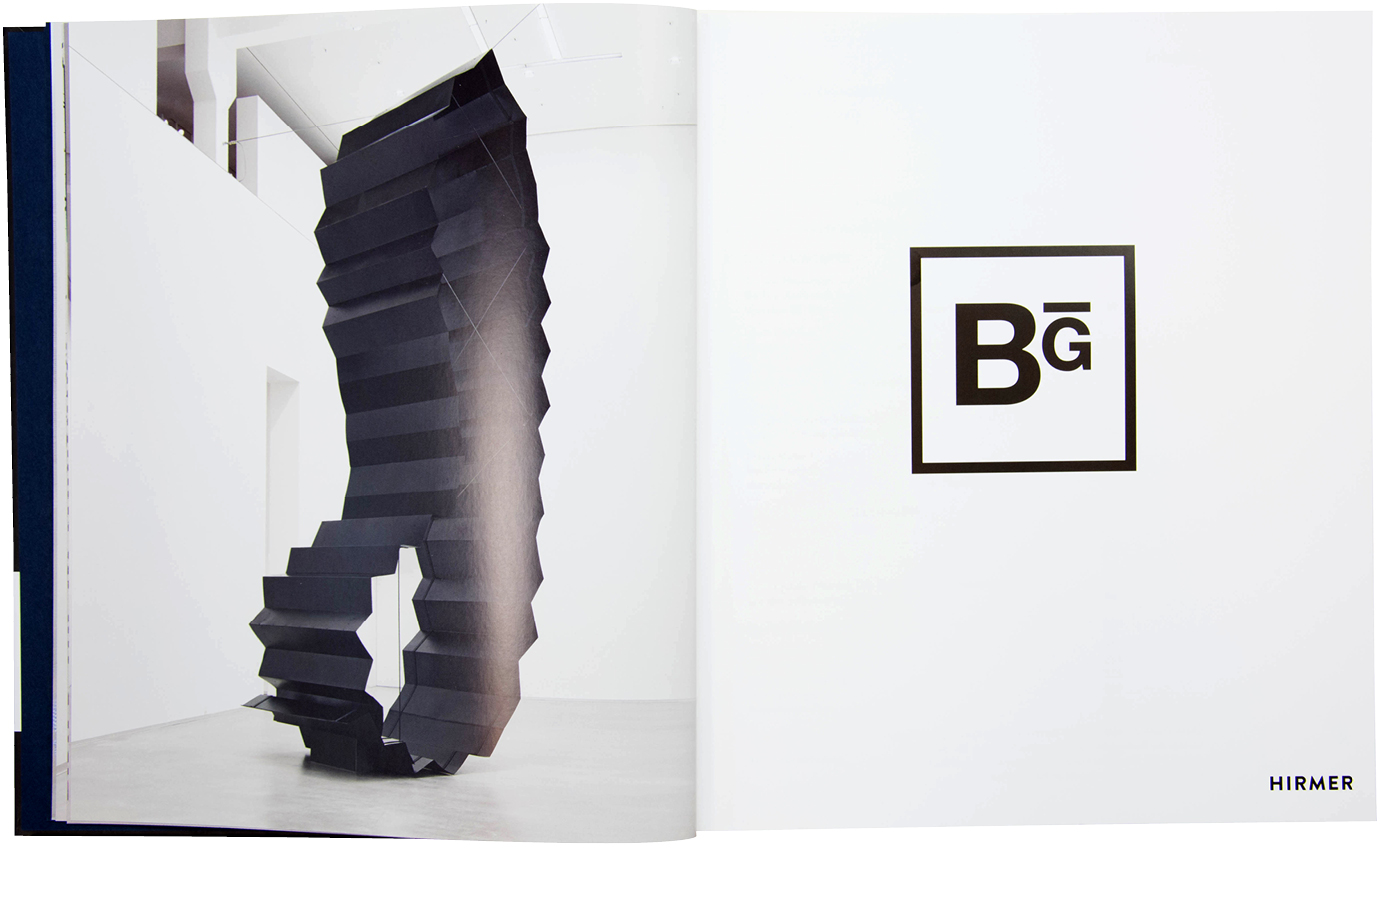 http://e-o-t.de/wordpress/wp-content/uploads/2017/06/2015_eot-BG-Jubilaeum-Book-5.jpg